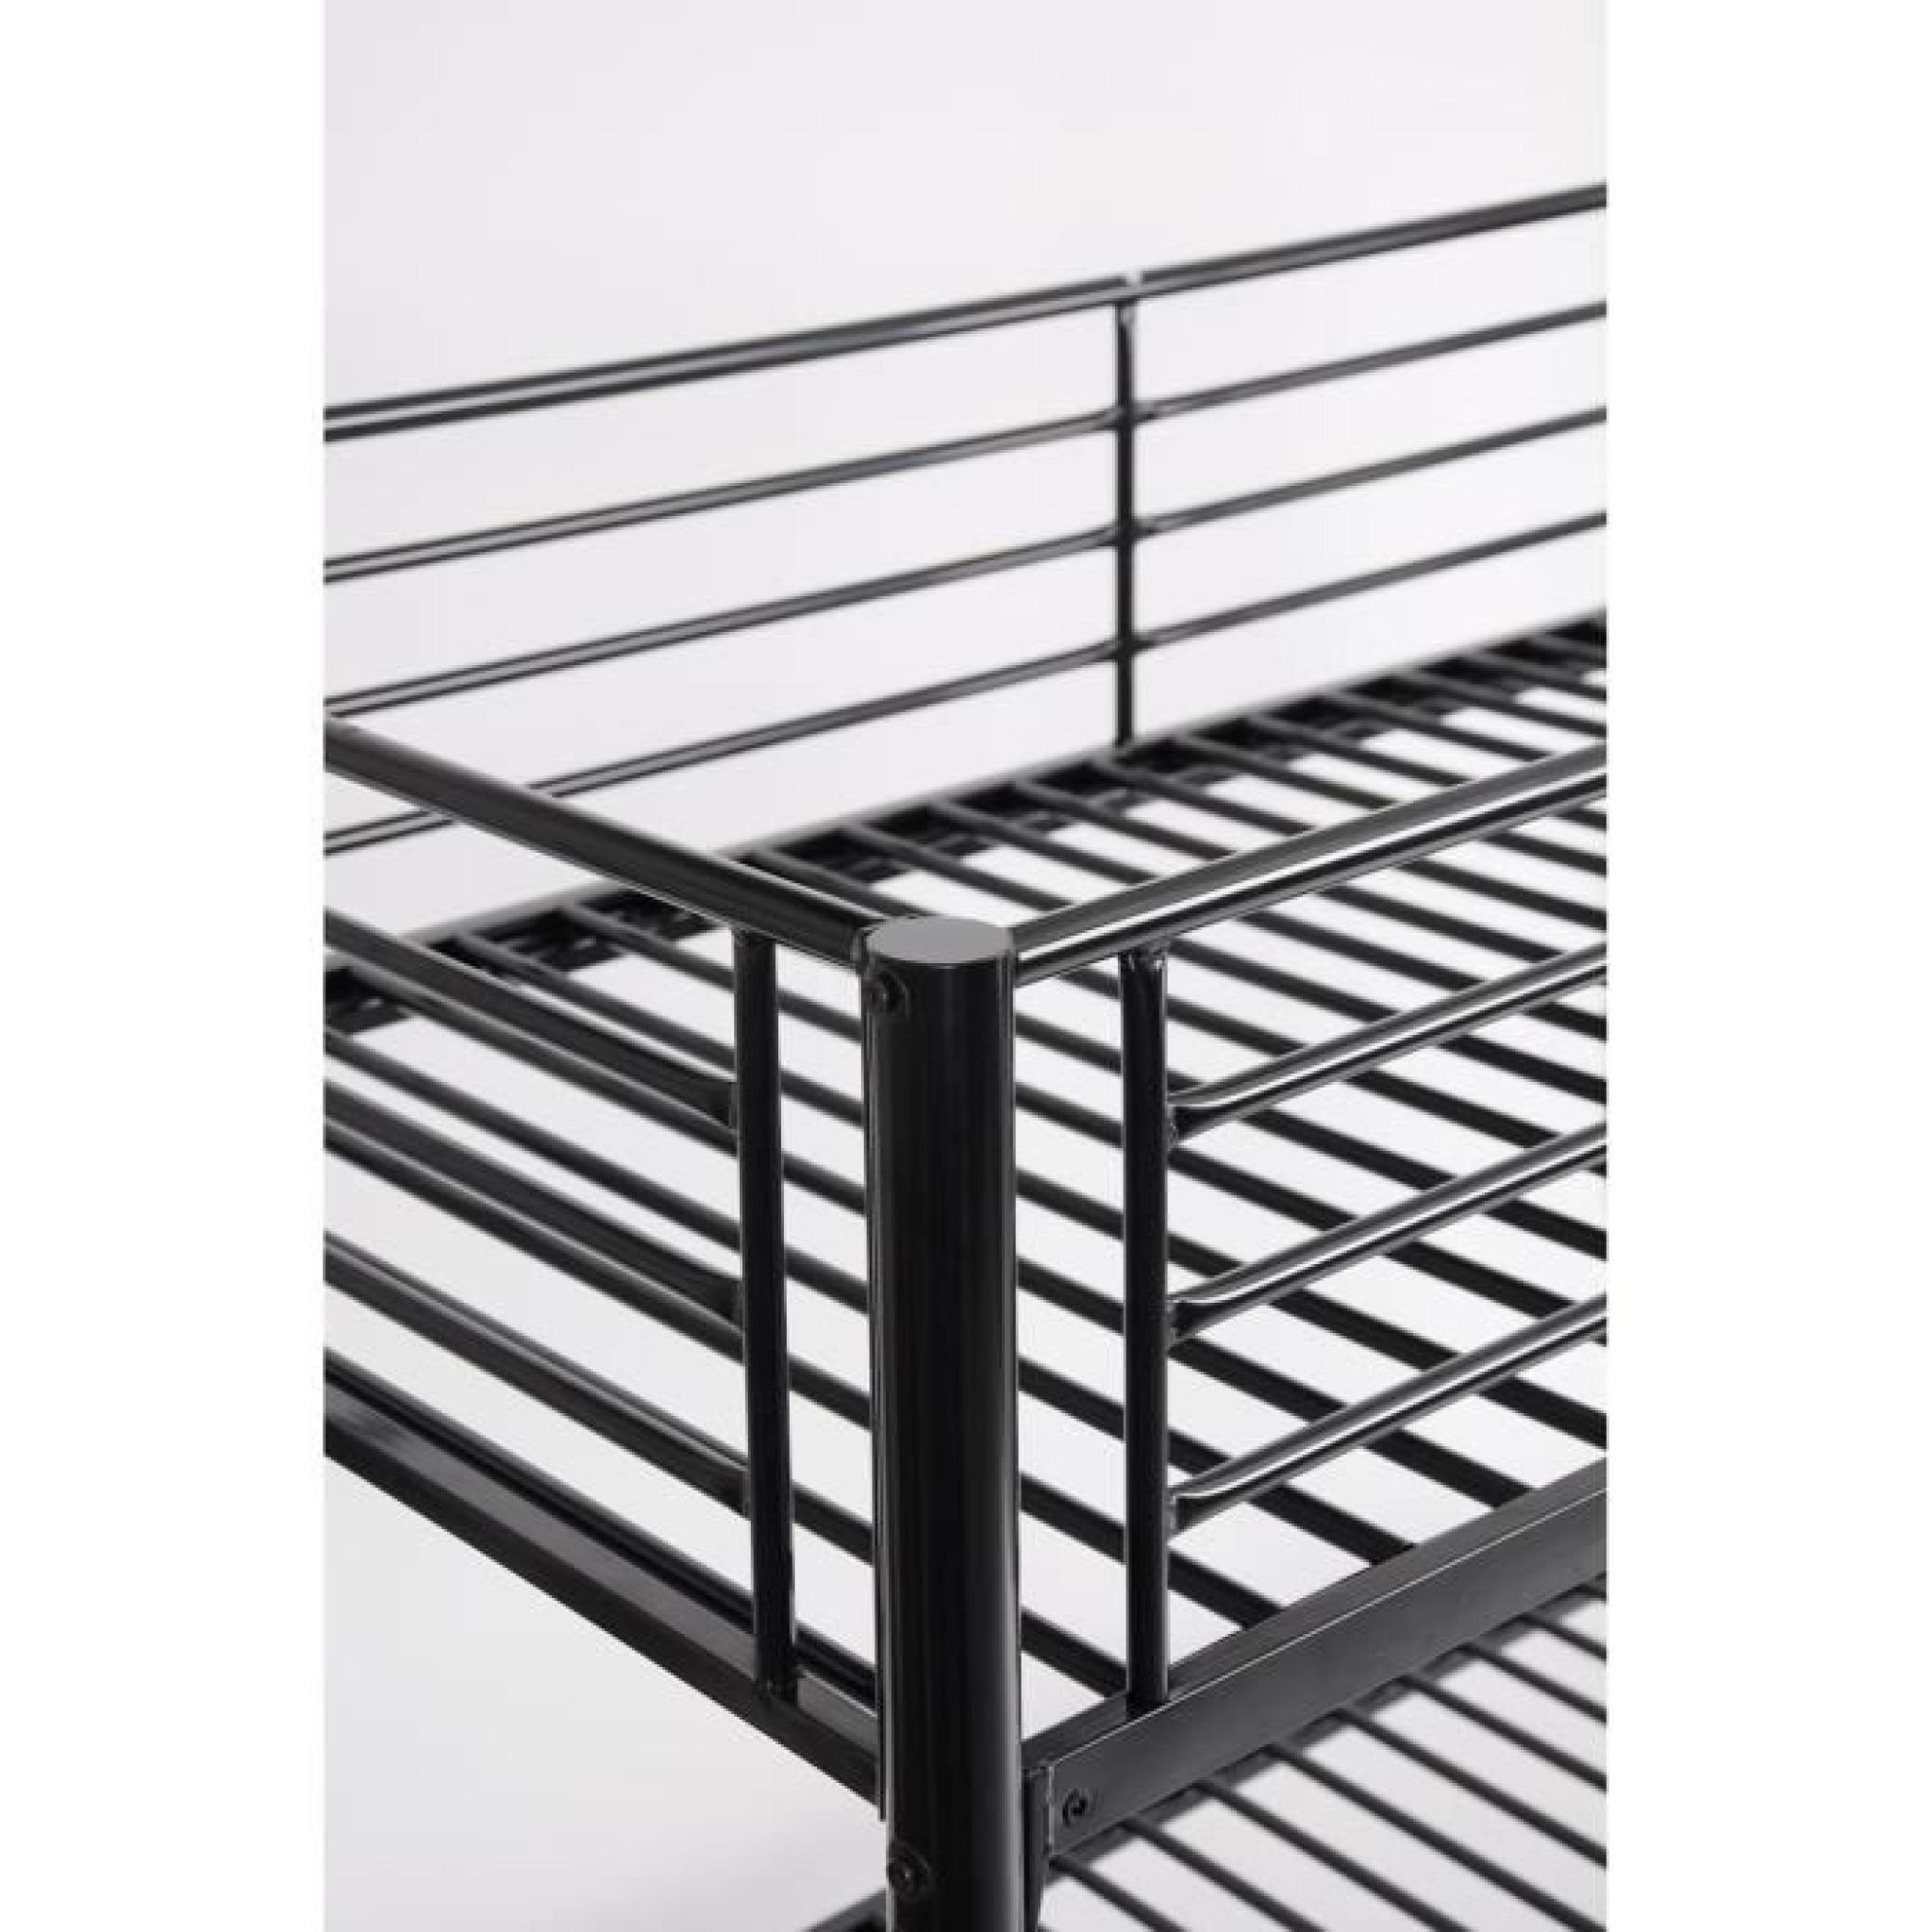 finlandek lit superpos double 90x140cm noir leijona. Black Bedroom Furniture Sets. Home Design Ideas